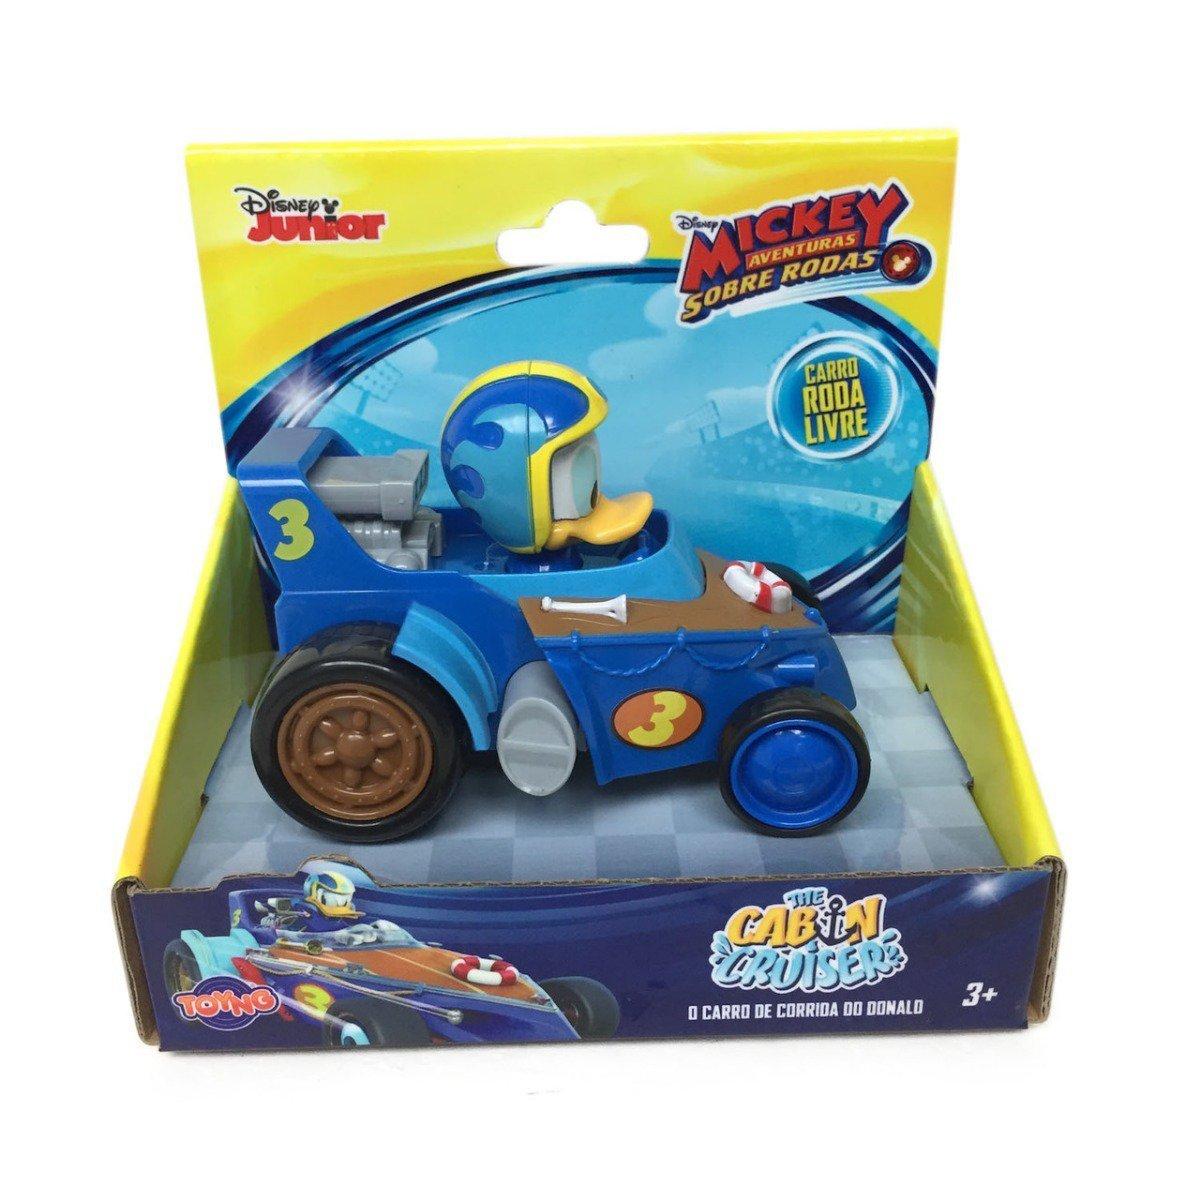 Carrinho Pato Donald - Mickey Aventuras Sobre Rodas - Hot Road - Toyng 33450